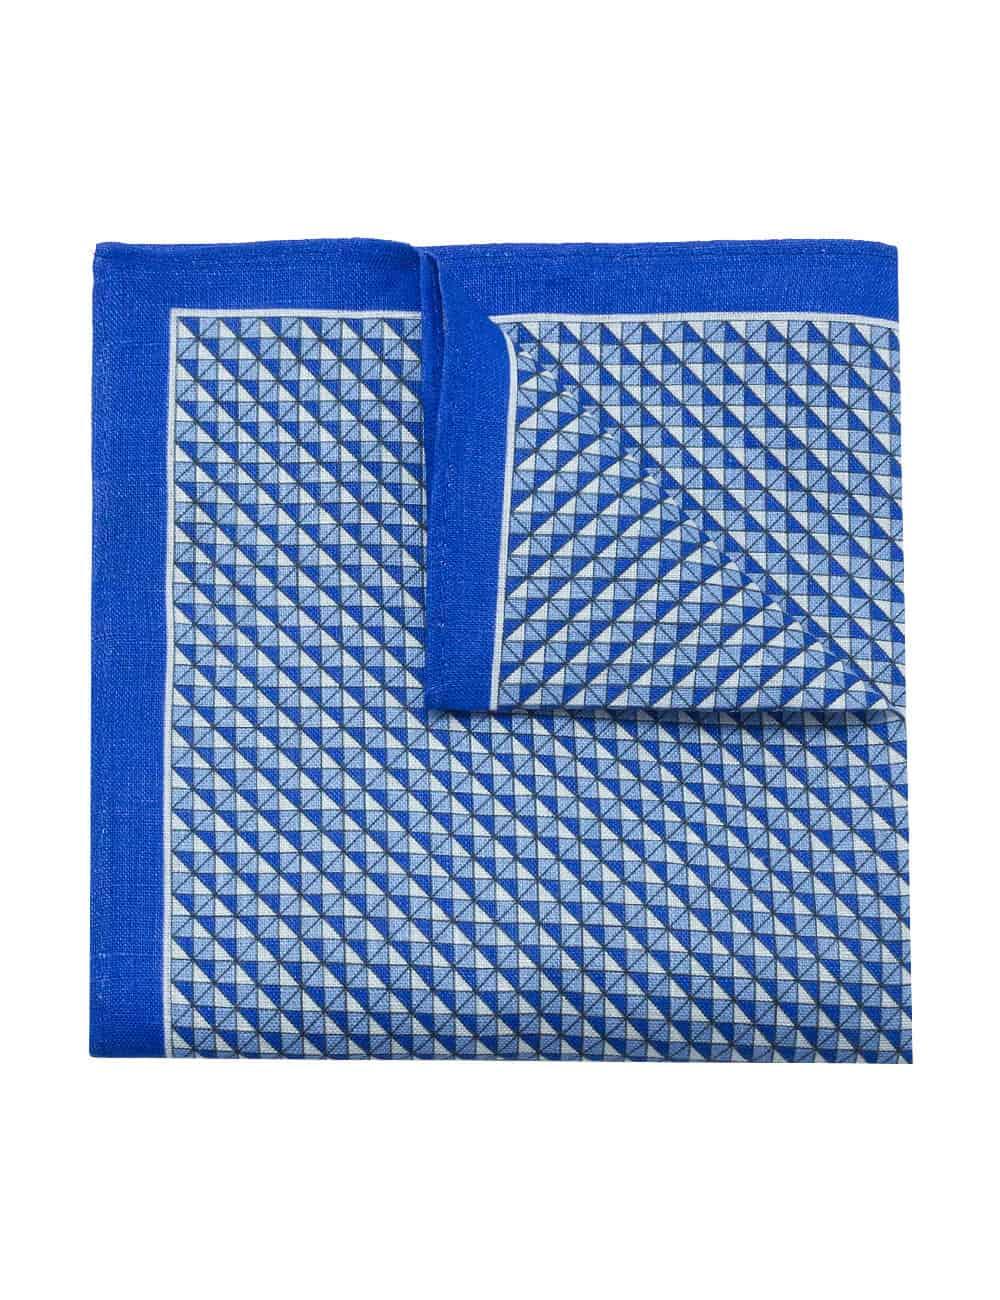 Pocket Square Gift Set G PSQGS7.14